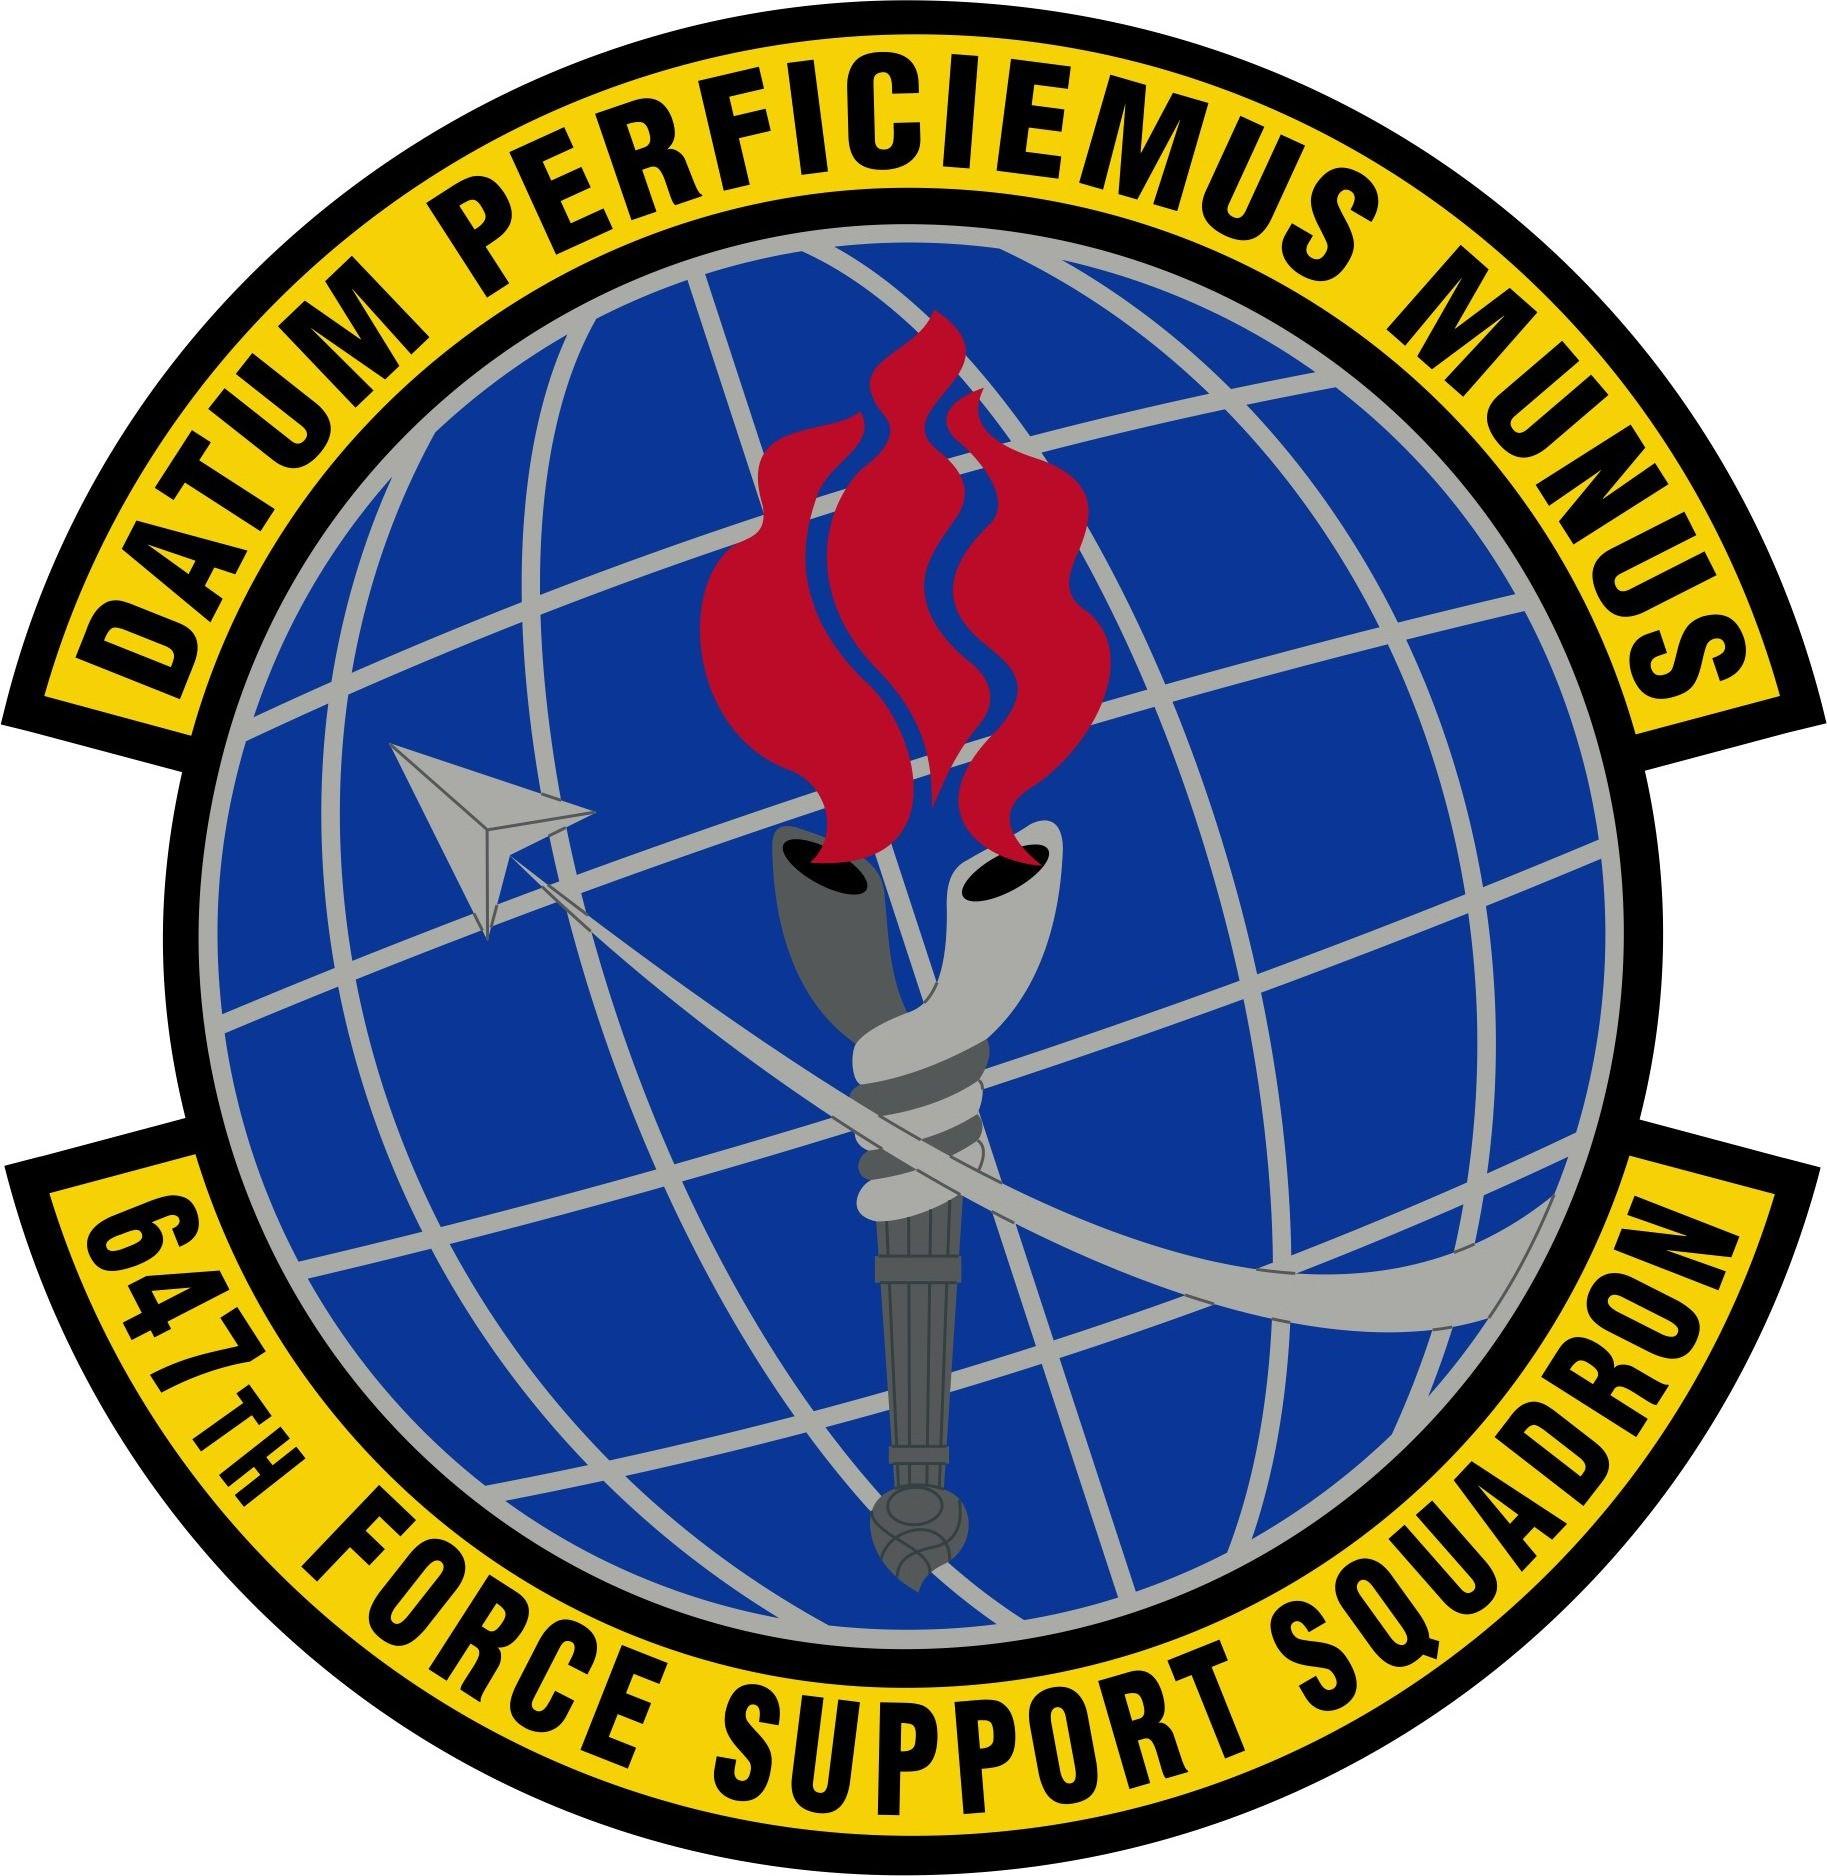 647 Force Support Squadron Emblem